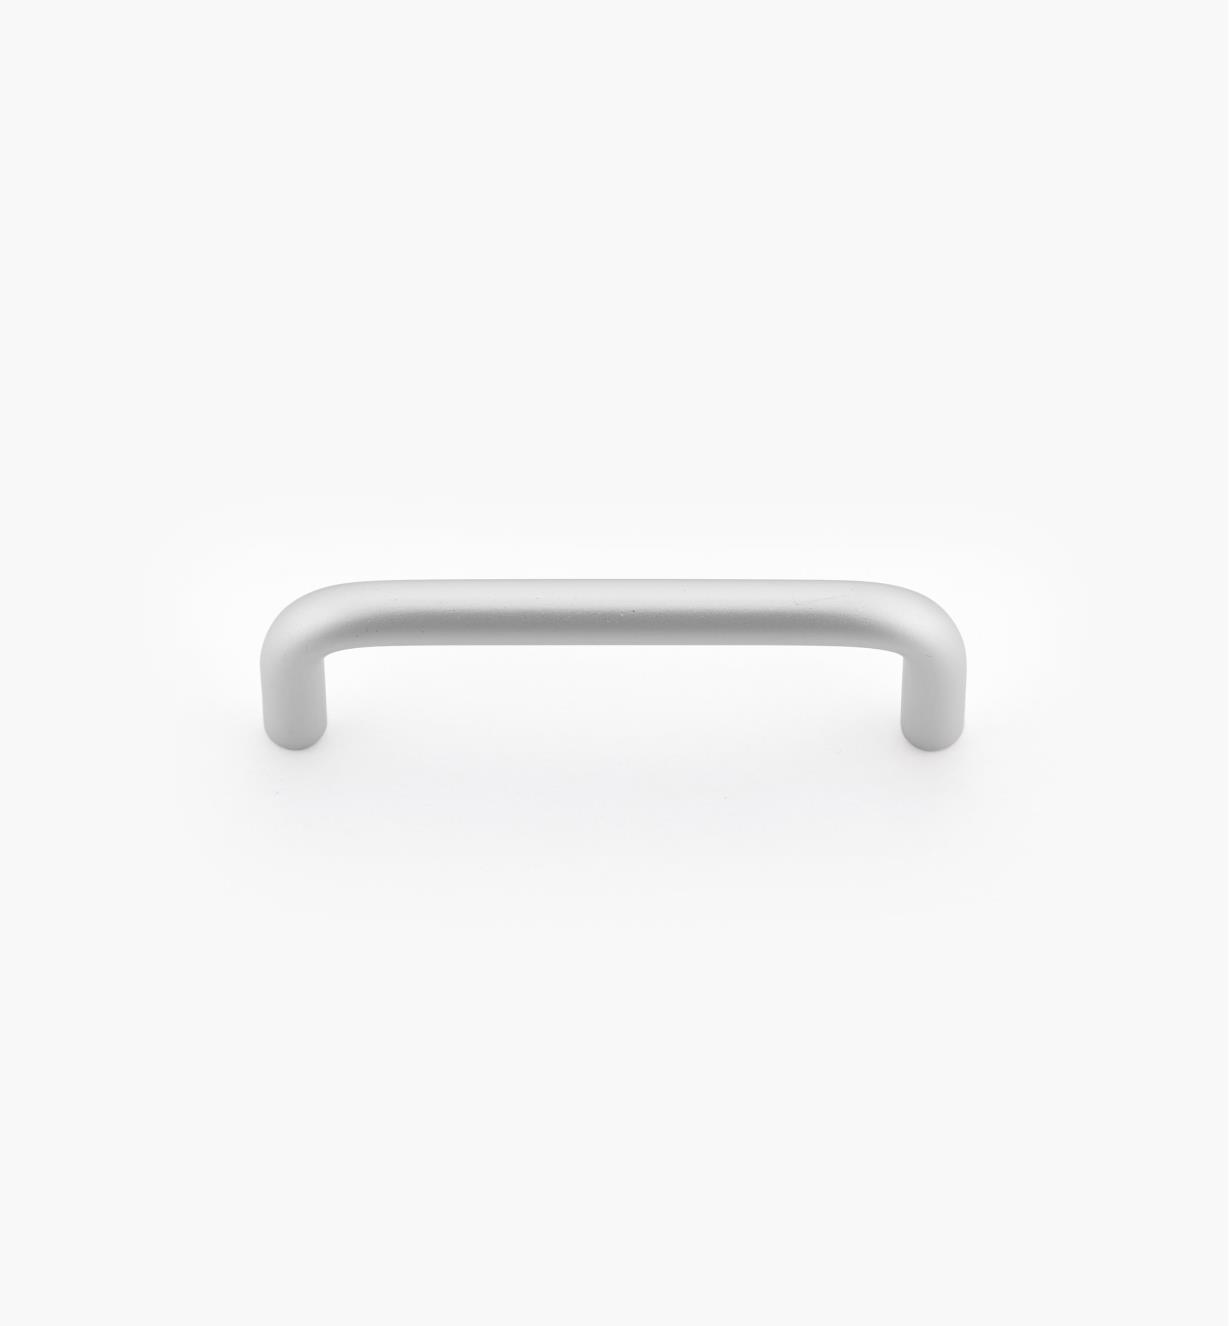 01W7601 - Poignée-fil moderne, aluminium satiné, 3po